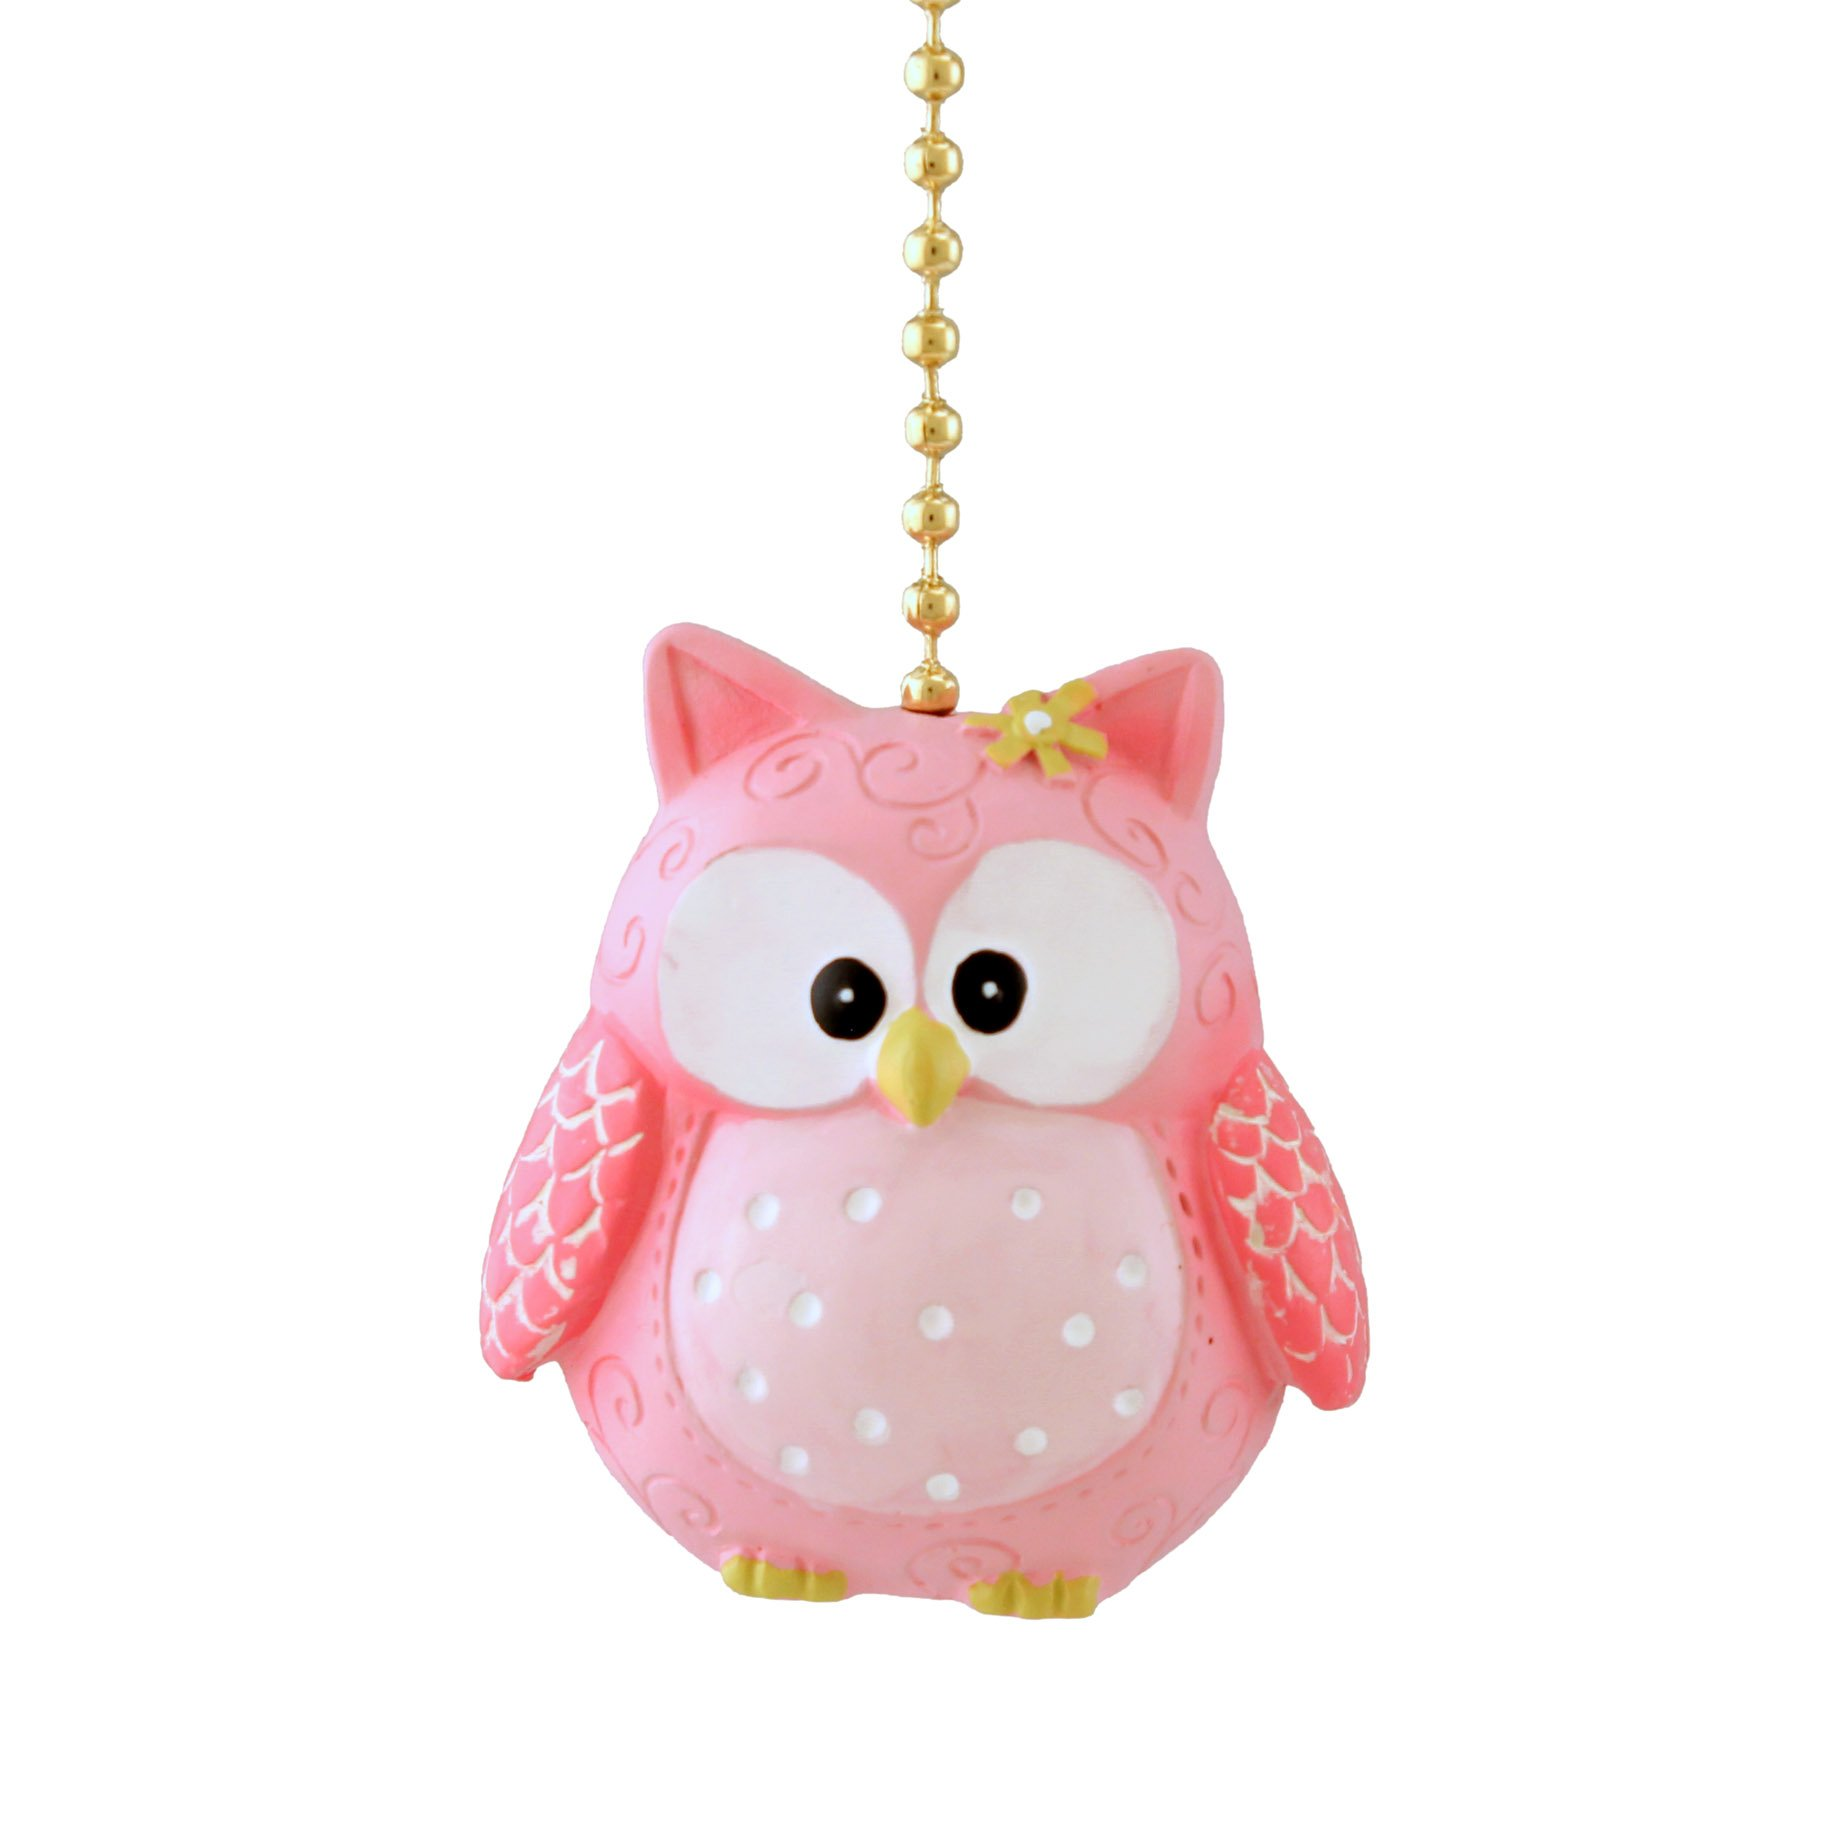 Clementine Design Pinky Owl Fan Pull